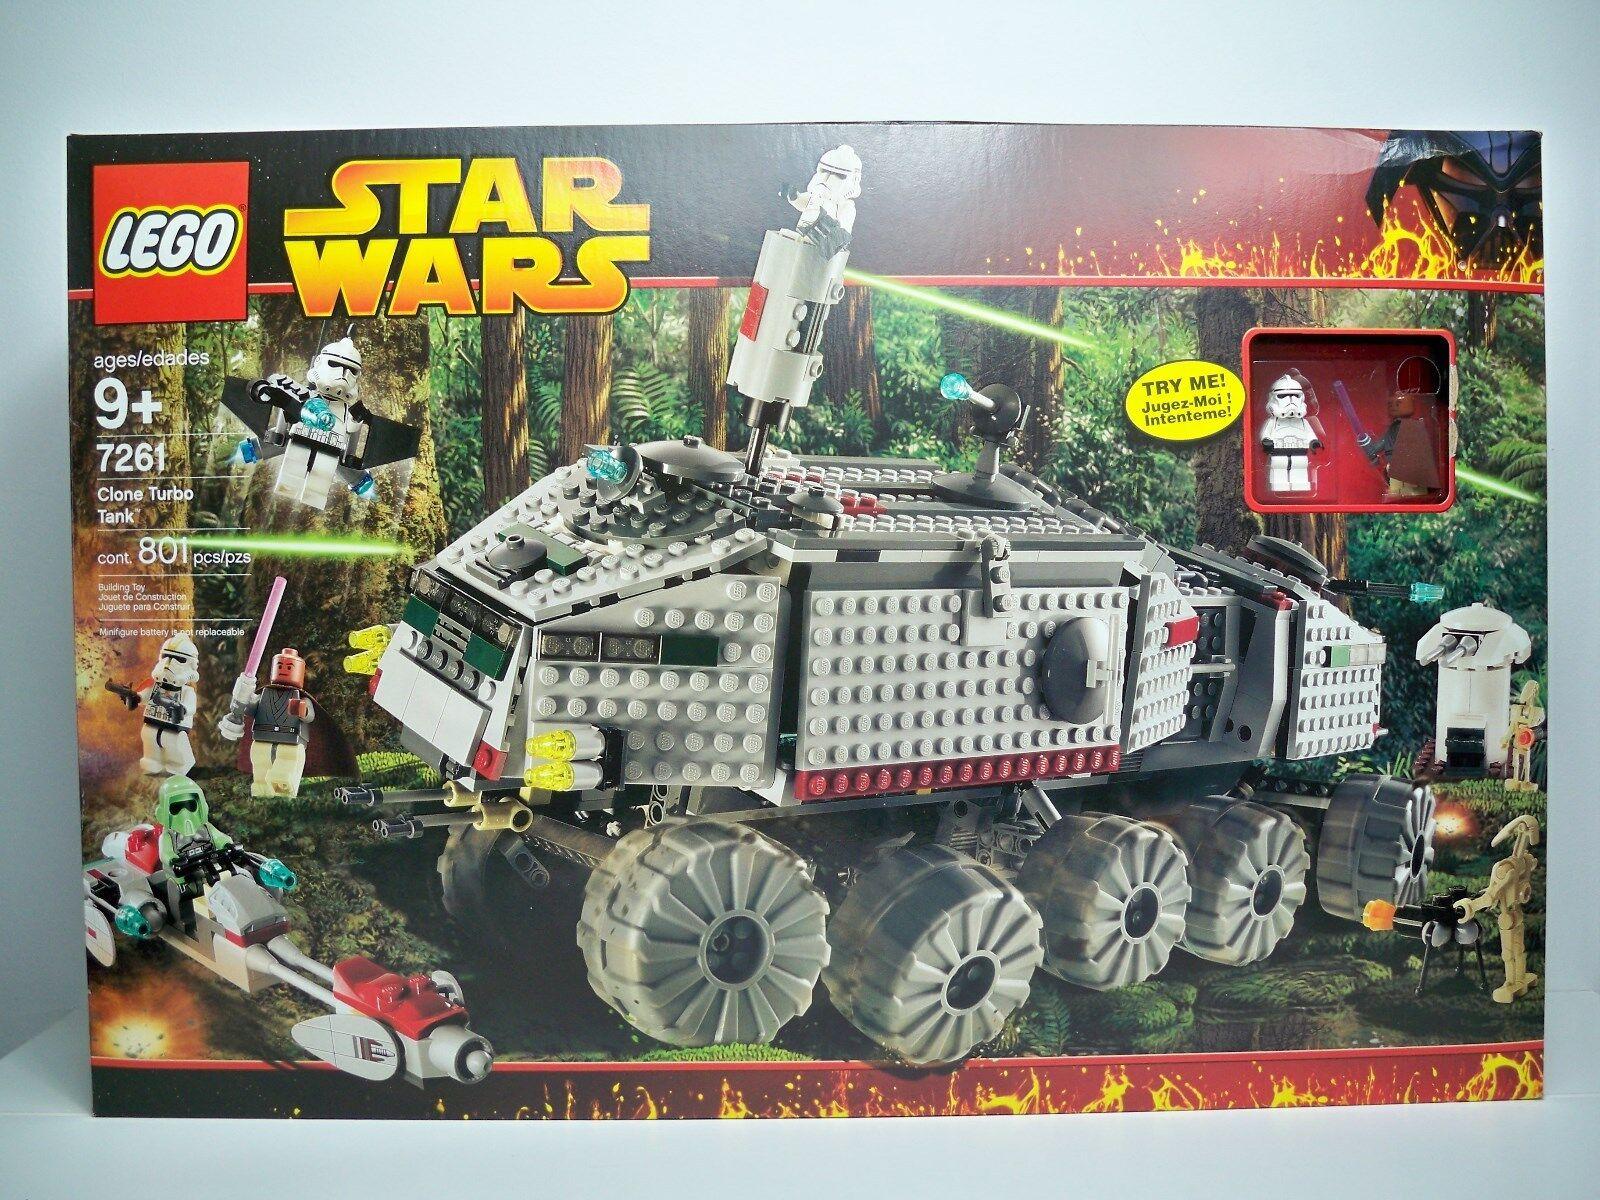 R0531712 Turbo Tank Estrella Wars Lego Misb Menta En Caja Sellada Sin Abrir